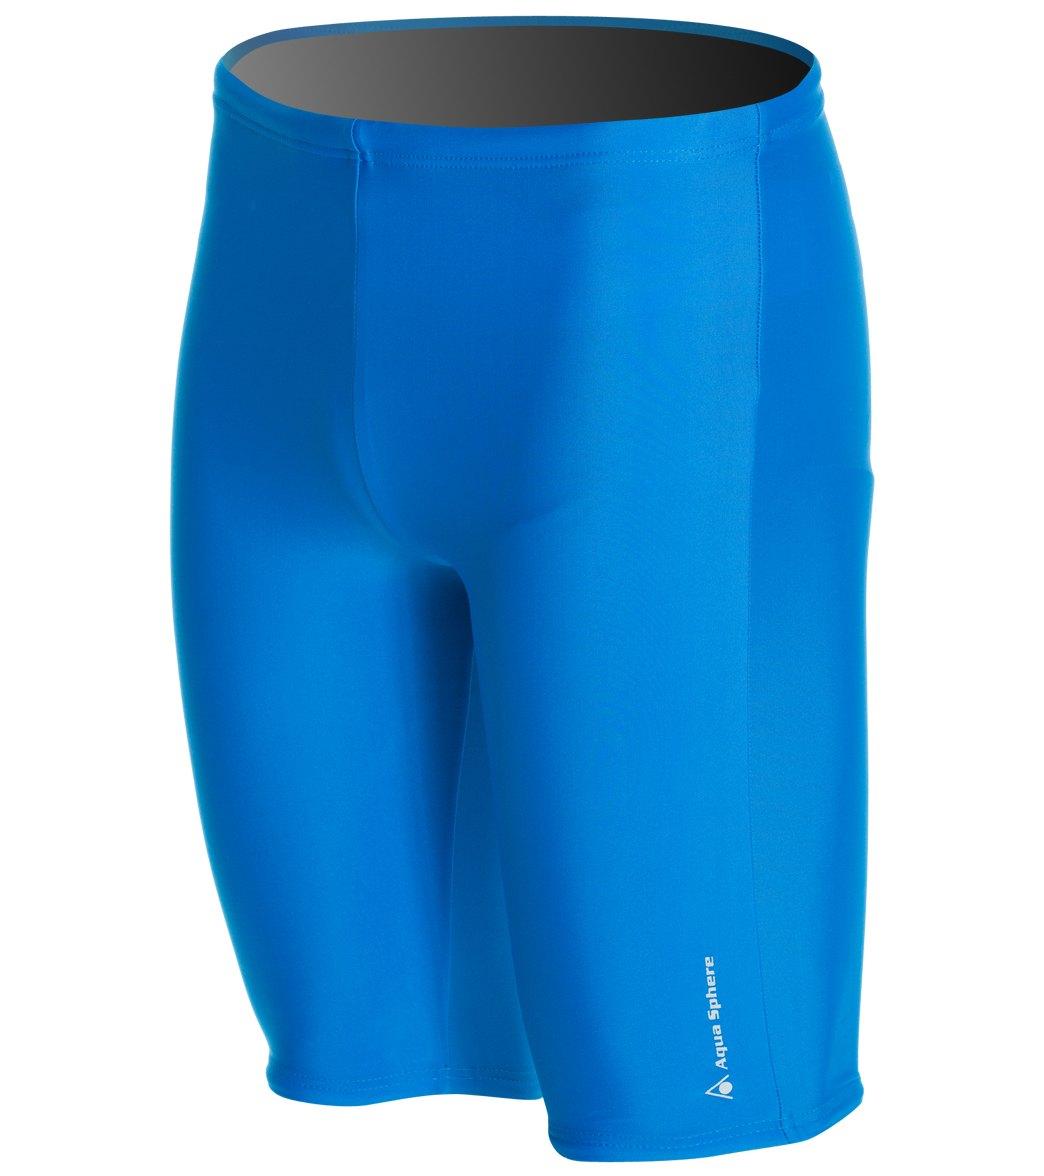 Aqua Sphere Montreal Jammer Swimsuit